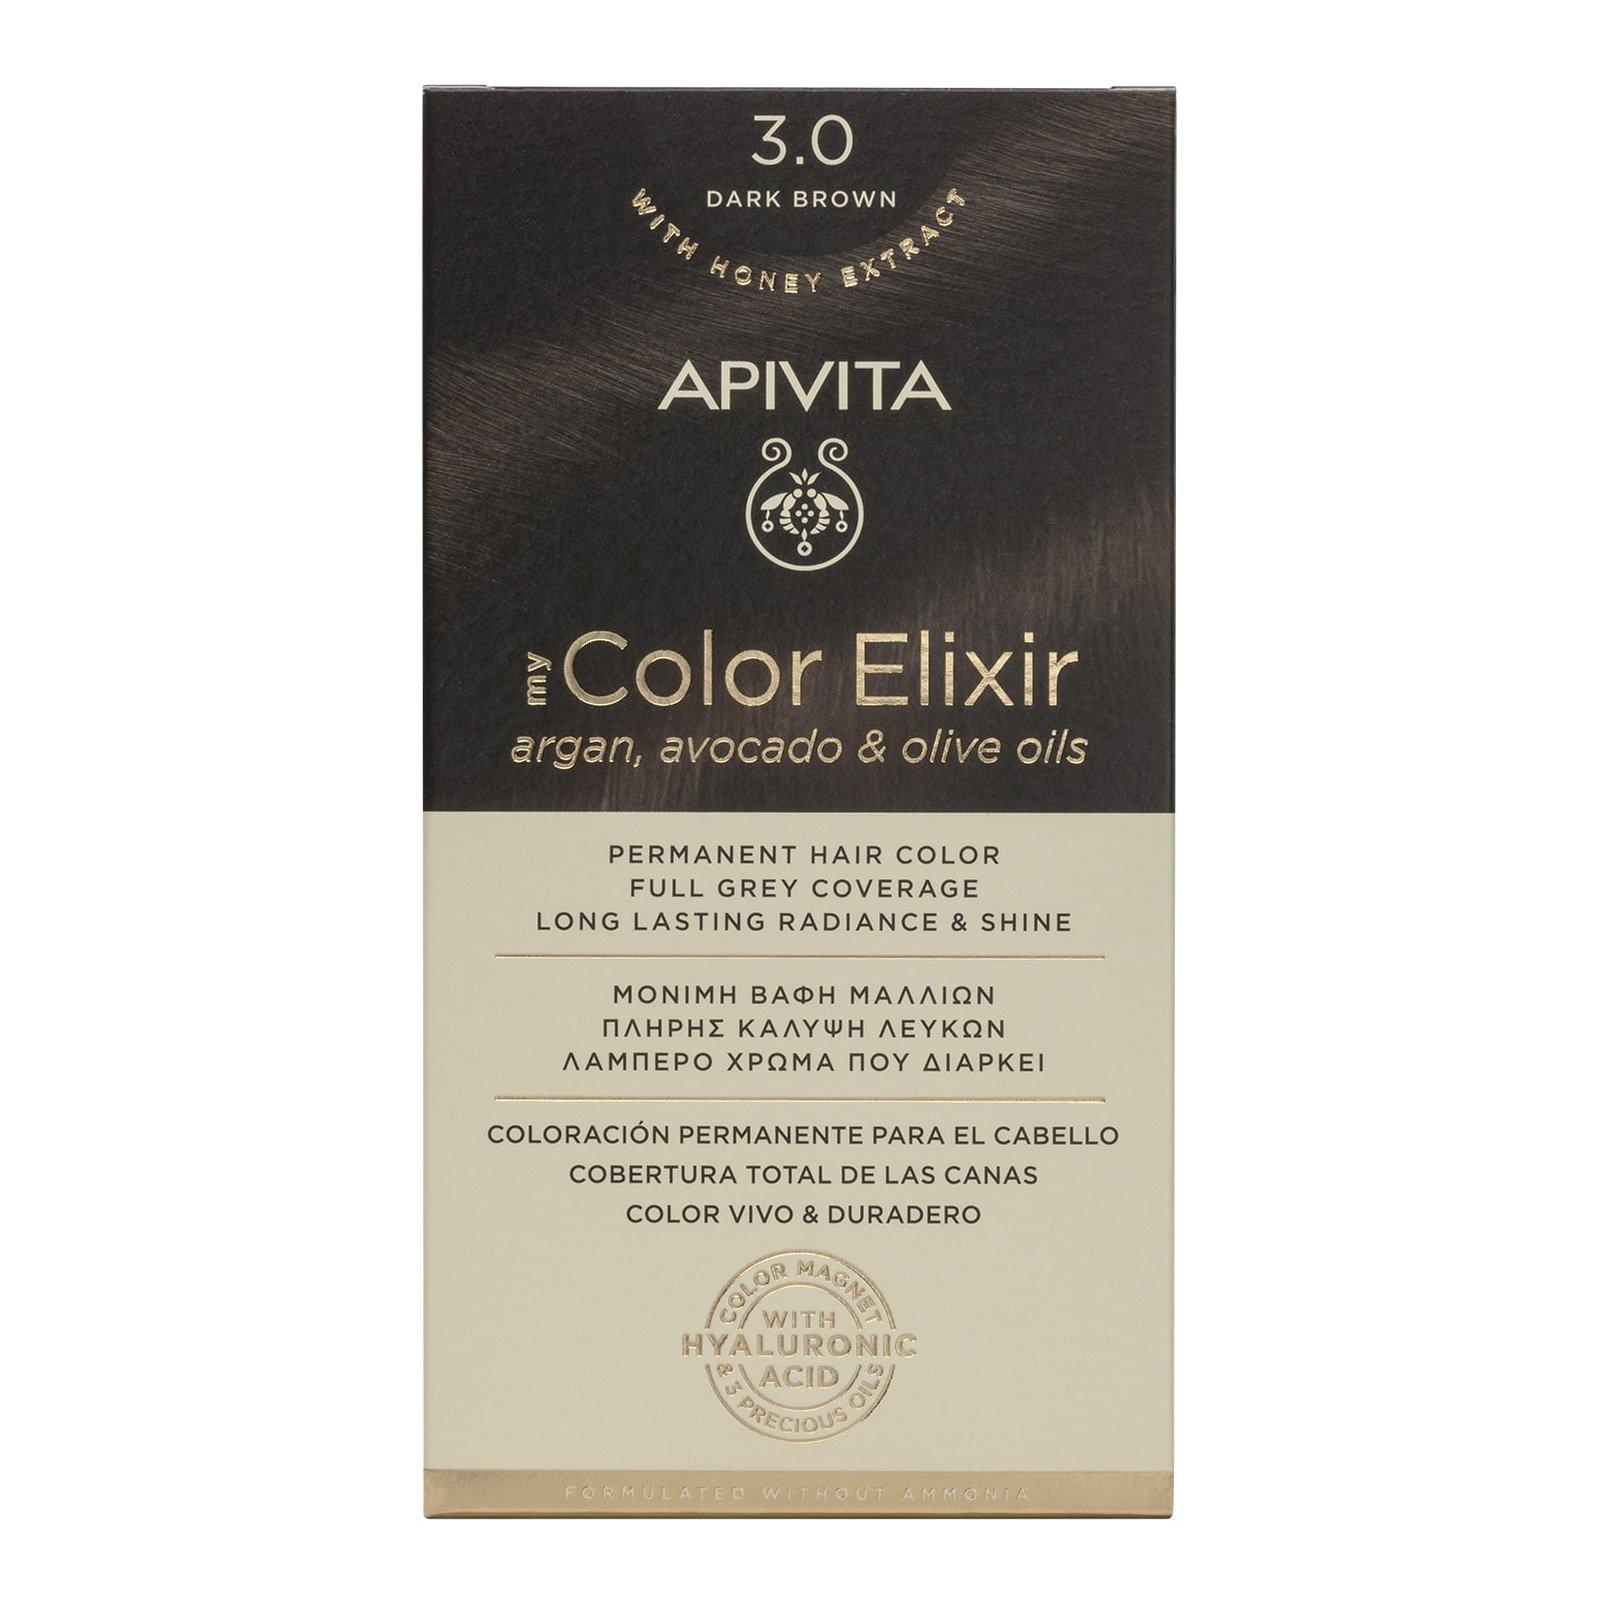 Apivita My Color Elixir Μόνιμη Βαφή Μαλλιών με Καινοτόμο Σύστημα Color Magnet που Σταθεροποιεί και Σφραγίζει το Χρώμα στην Τρίχα – N 3.0 ΚΑΣΤΑΝΟ ΣΚΟΥΡΟ